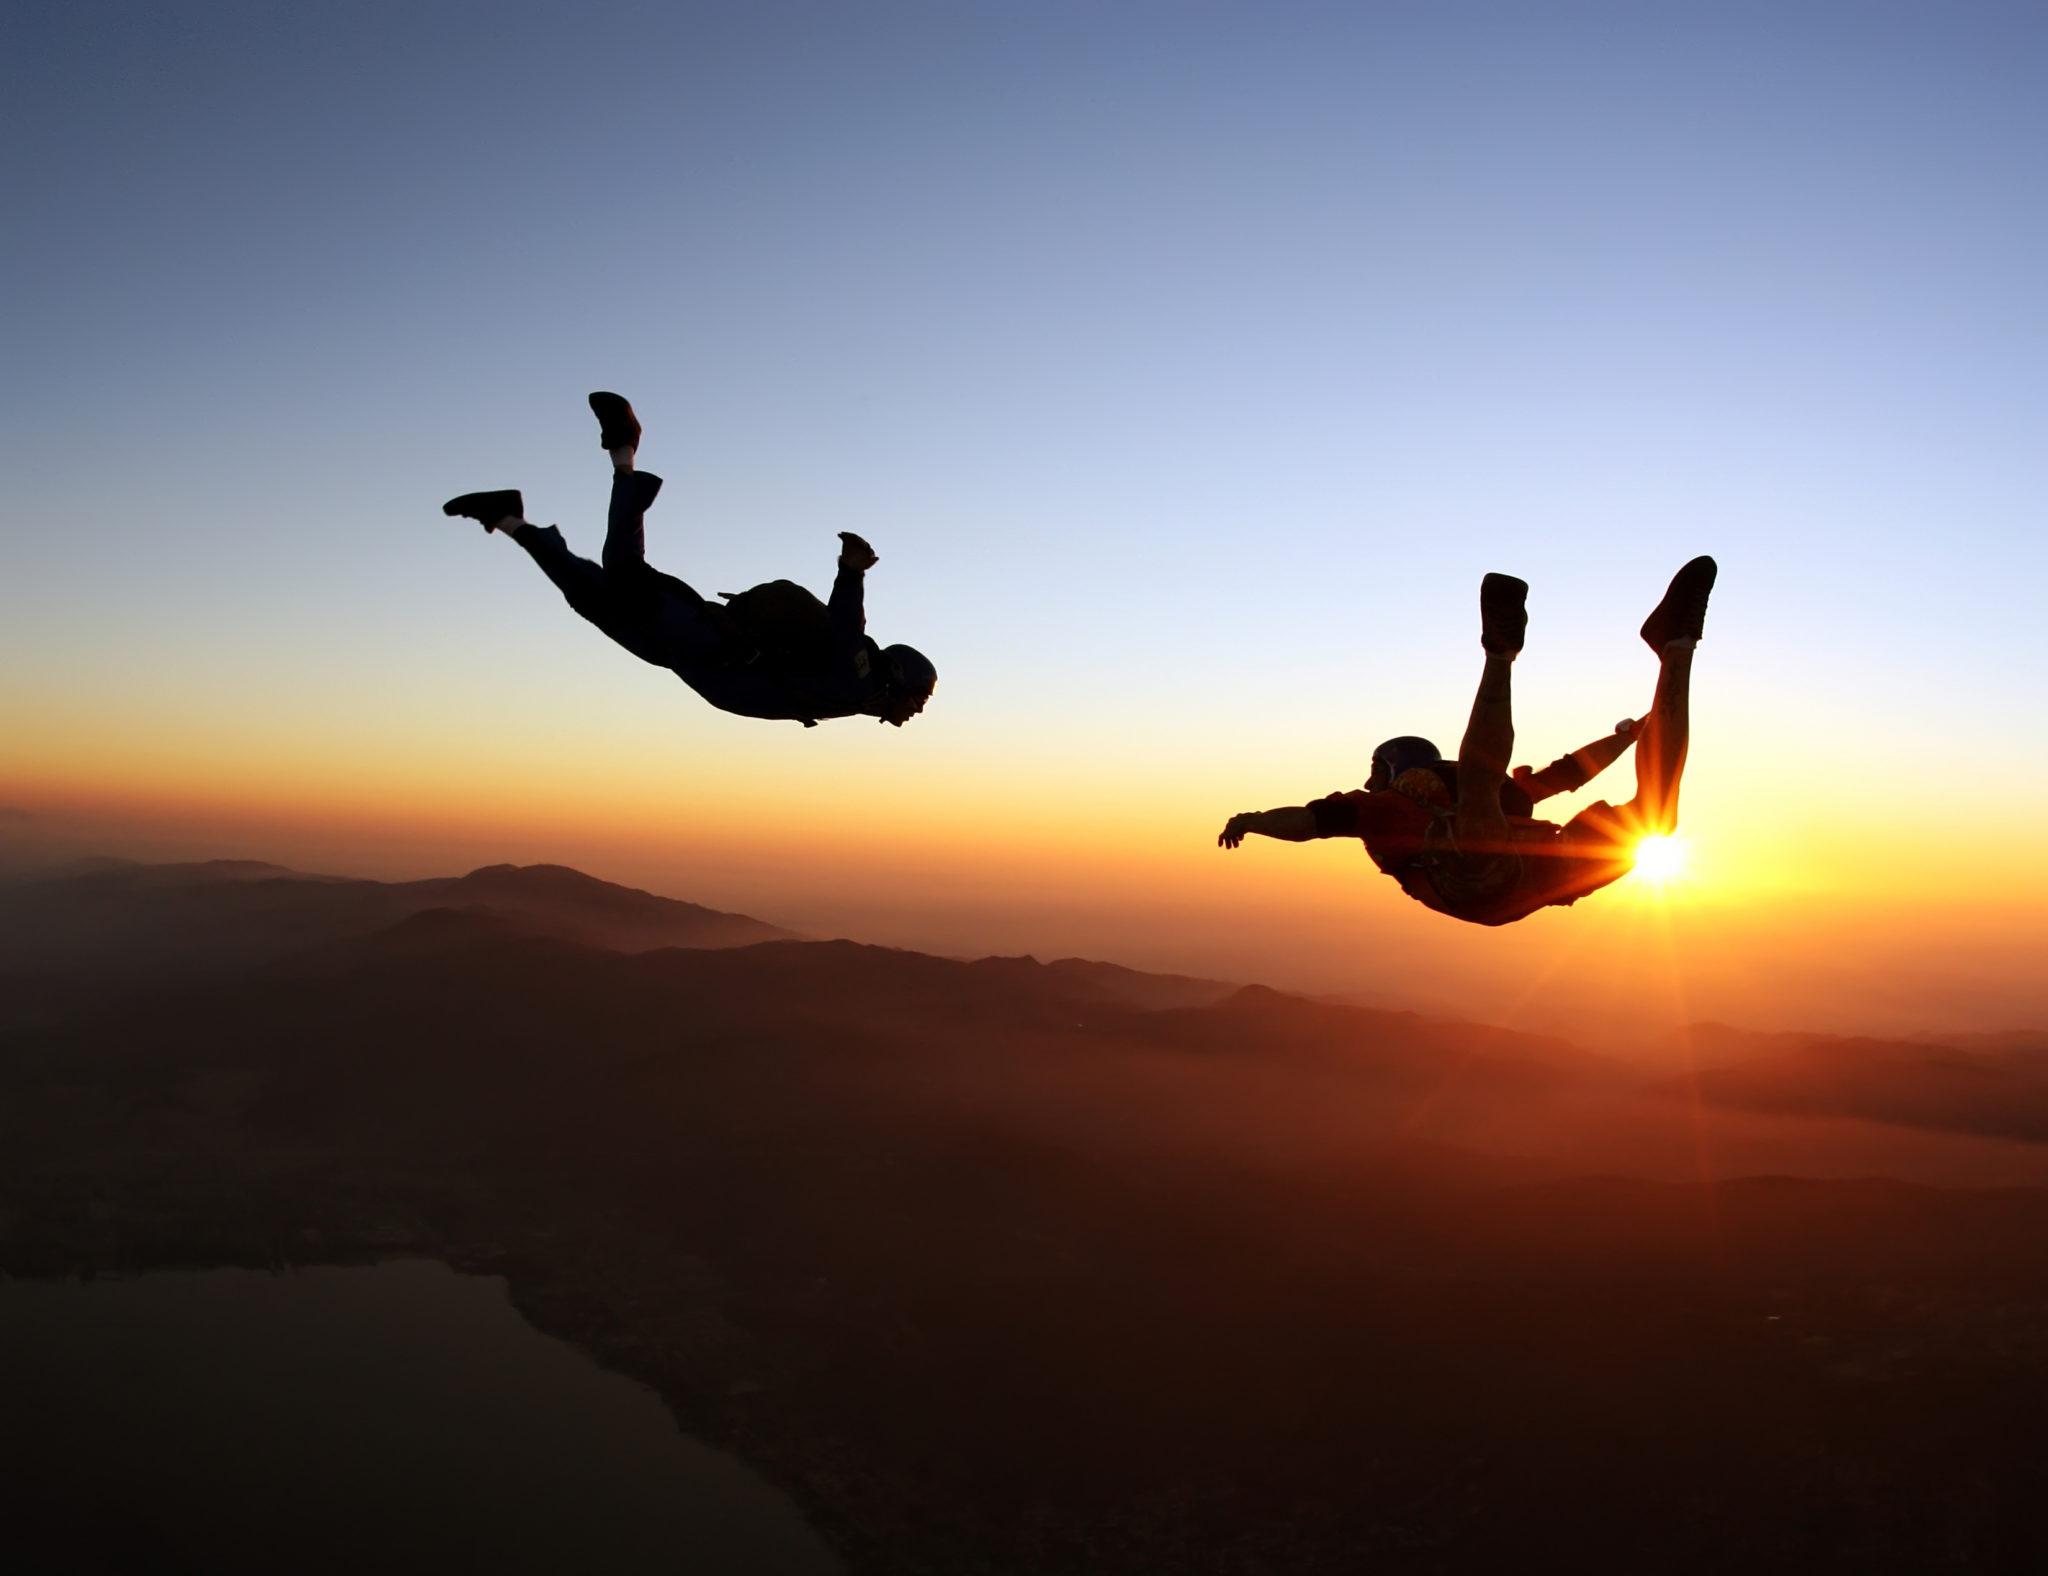 Adventure bucket list - skydiving